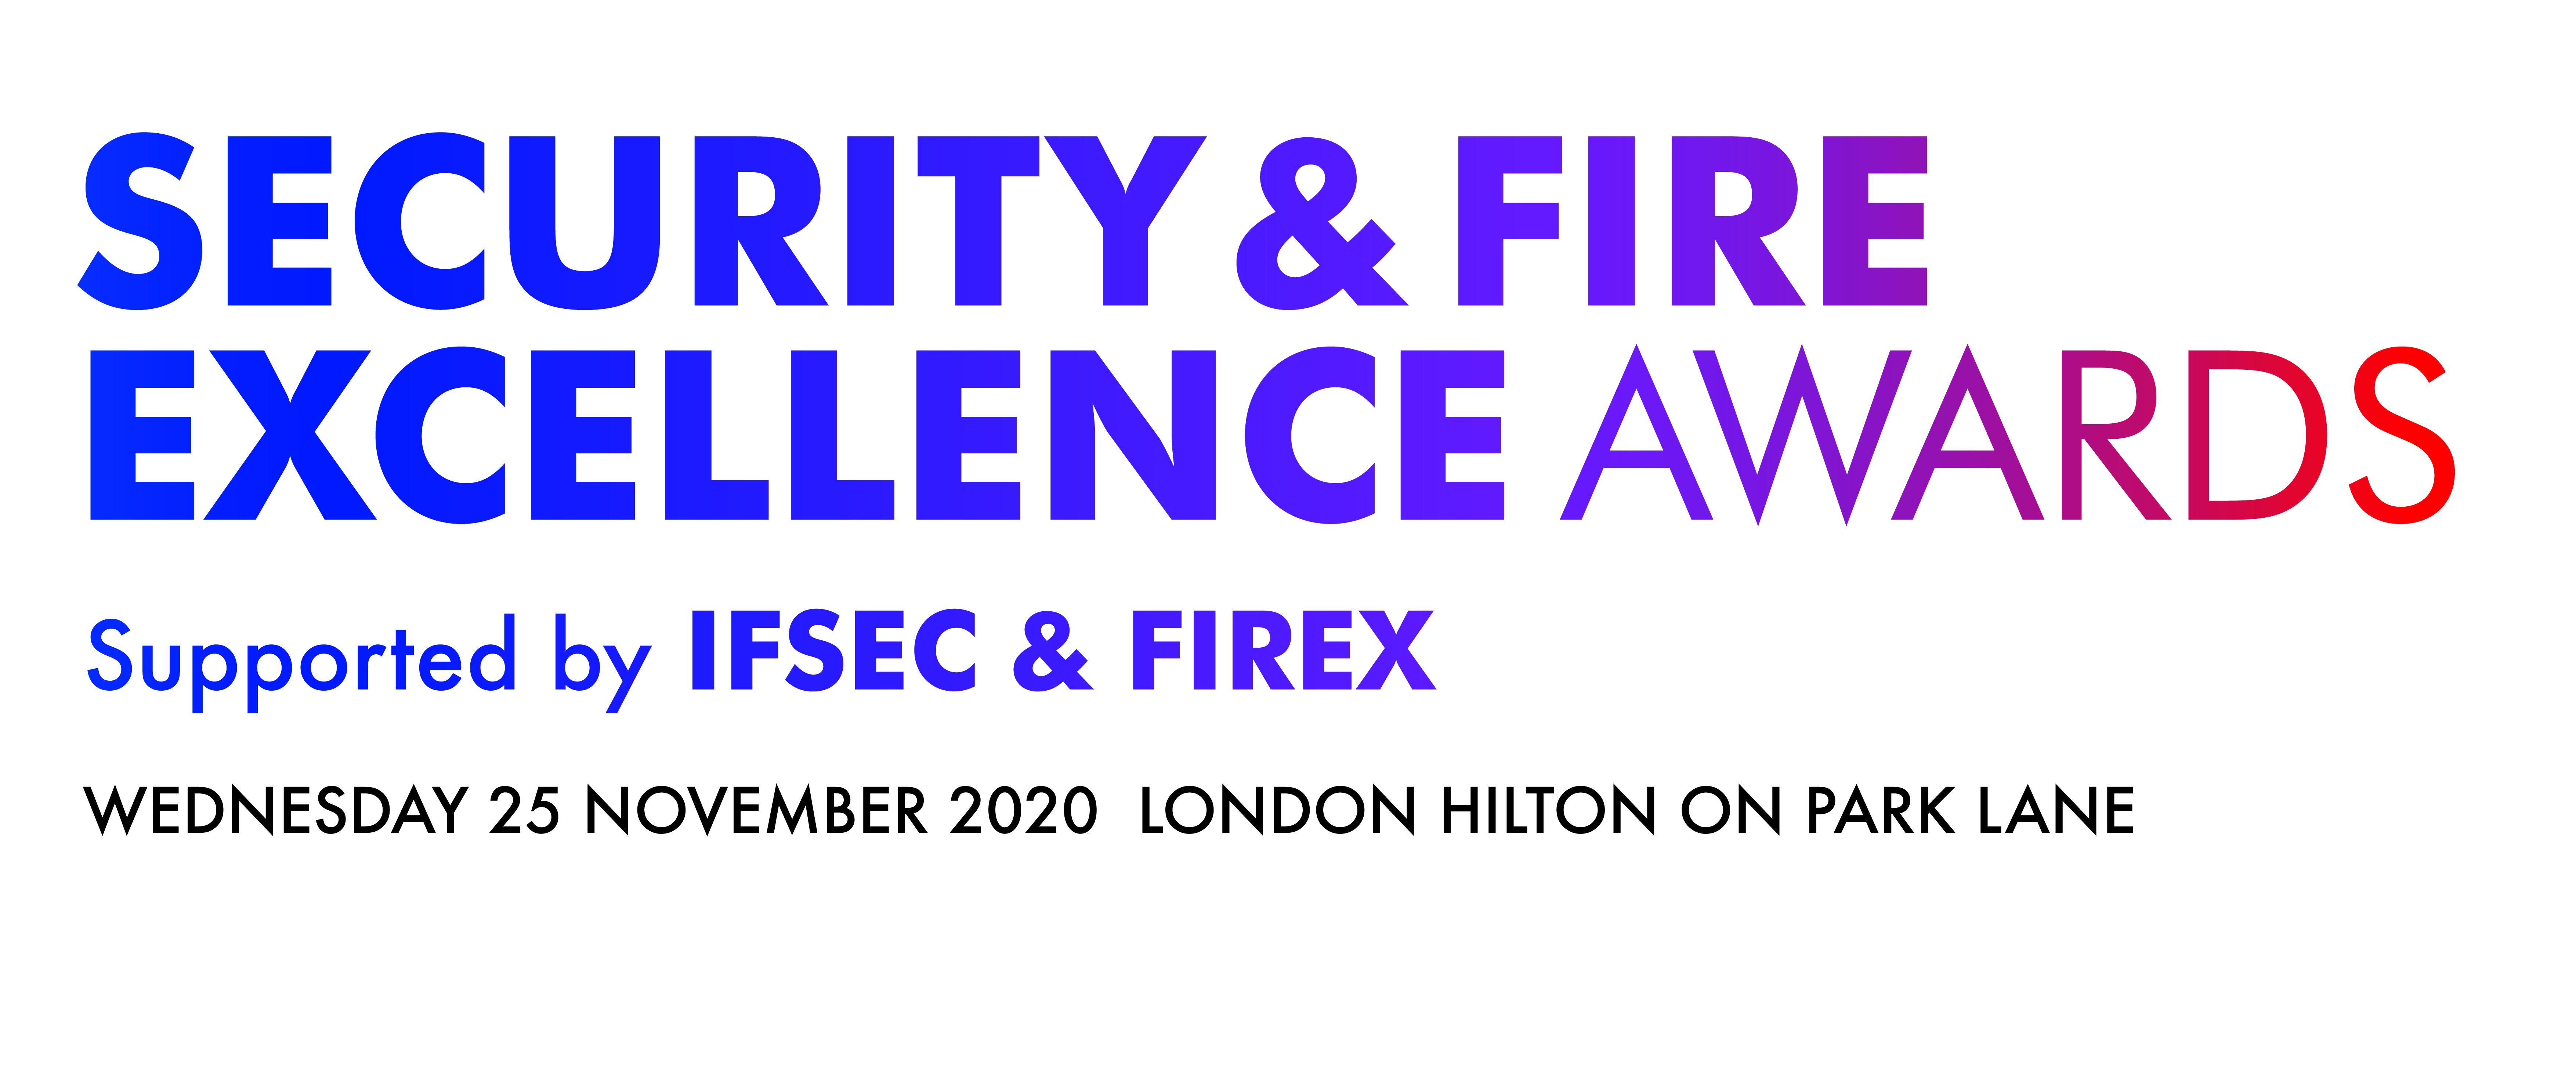 SecurityFireExcellenceAwards2020Logo